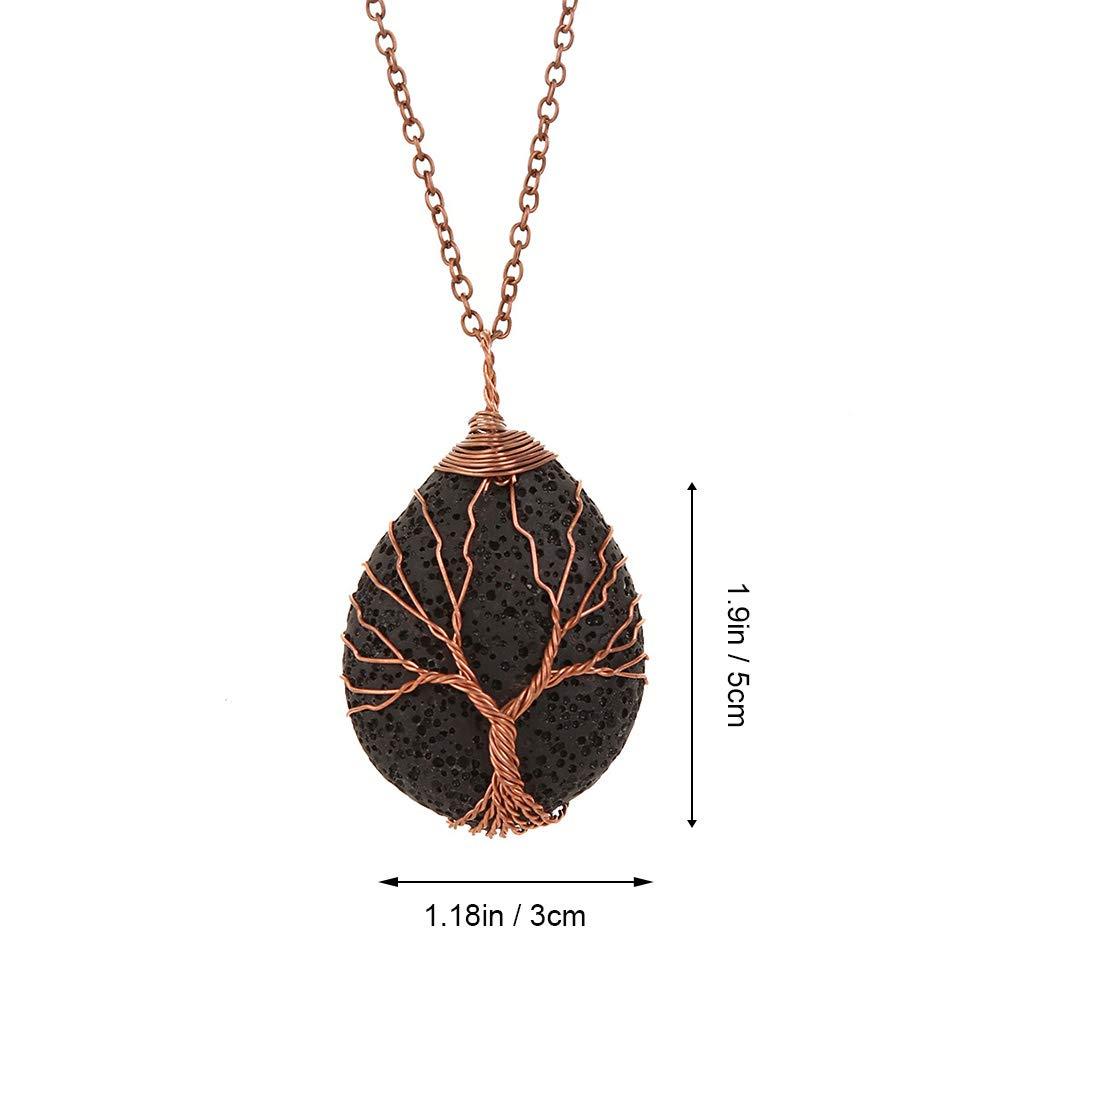 YGMONER Tree of Life Stone Pendant Car Charm Rear View Mirror Hanging Pendant DarkRed